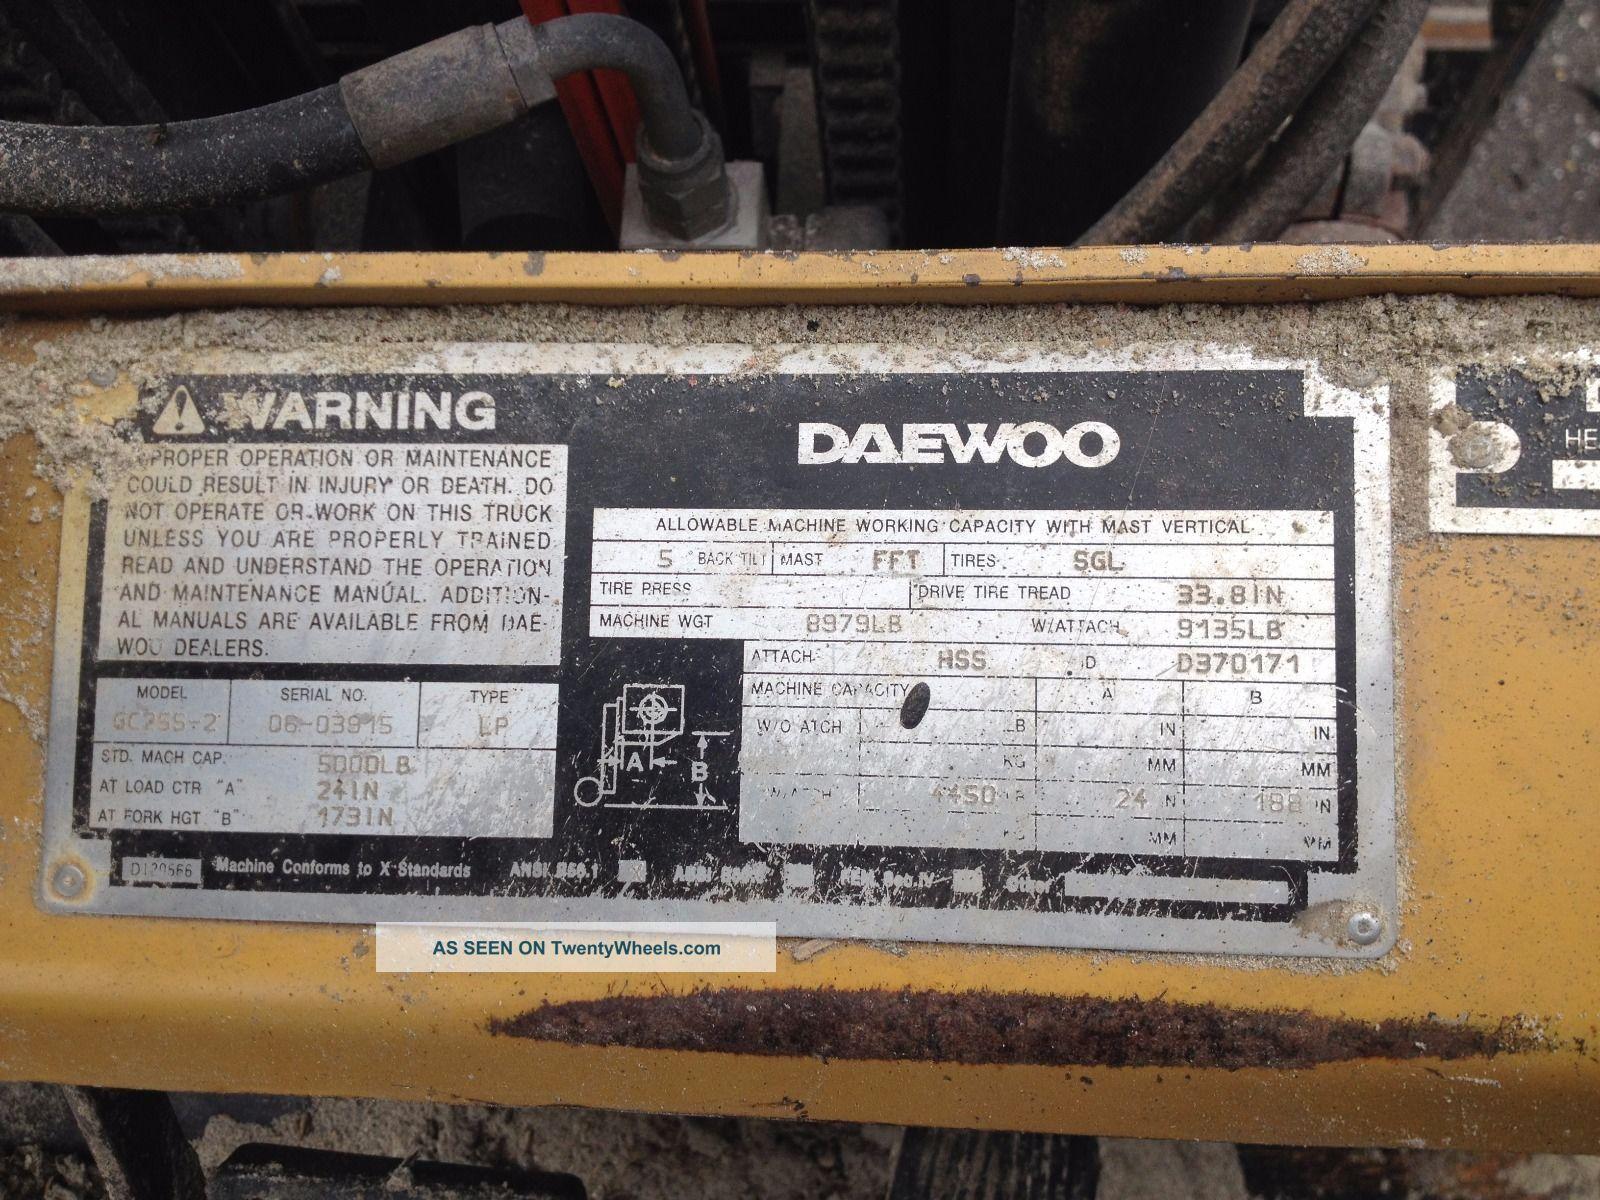 Daewoo Gc25s Forklift 4500lb Capacity, Propane, Side - Shift, No